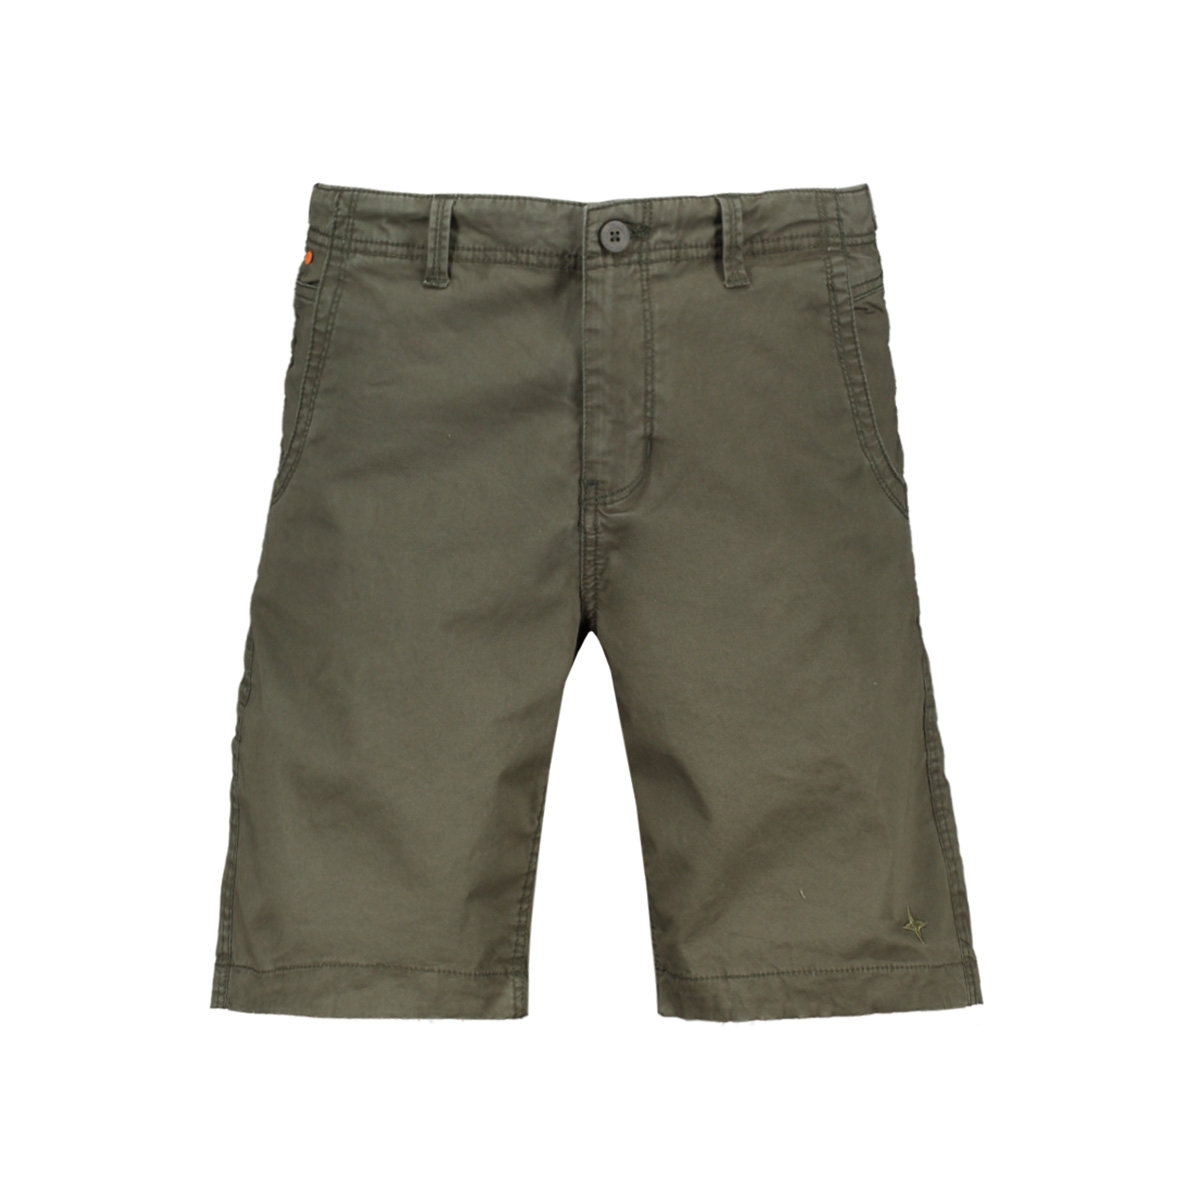 short casual mc11 0512 haze & finn korte broek khaki